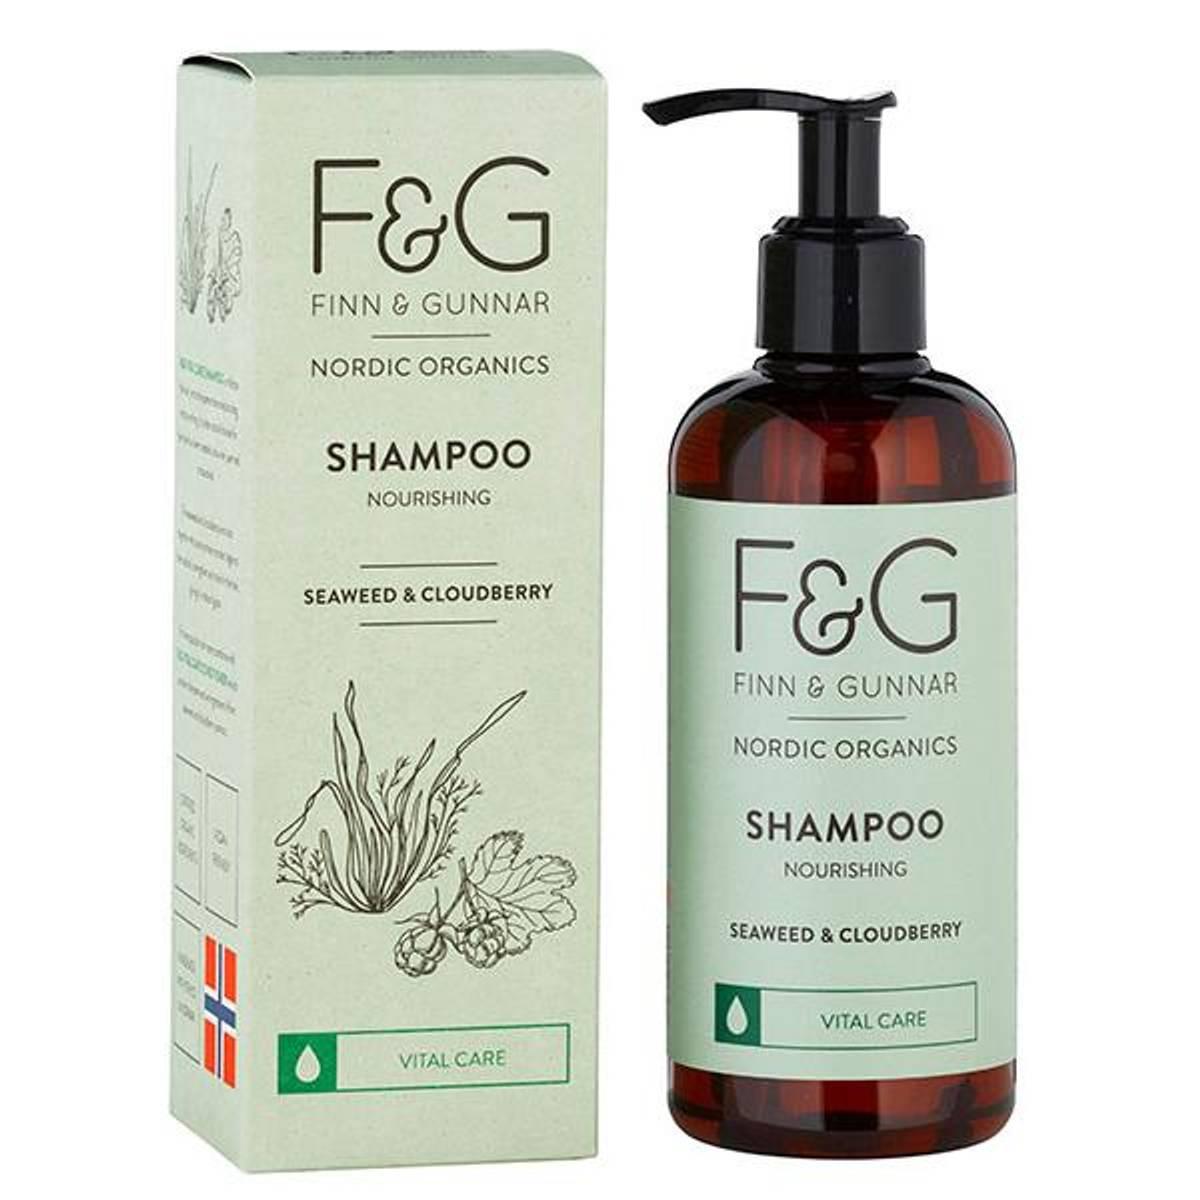 F&G Nordic Organics Shampoo Nourishing 250 ml